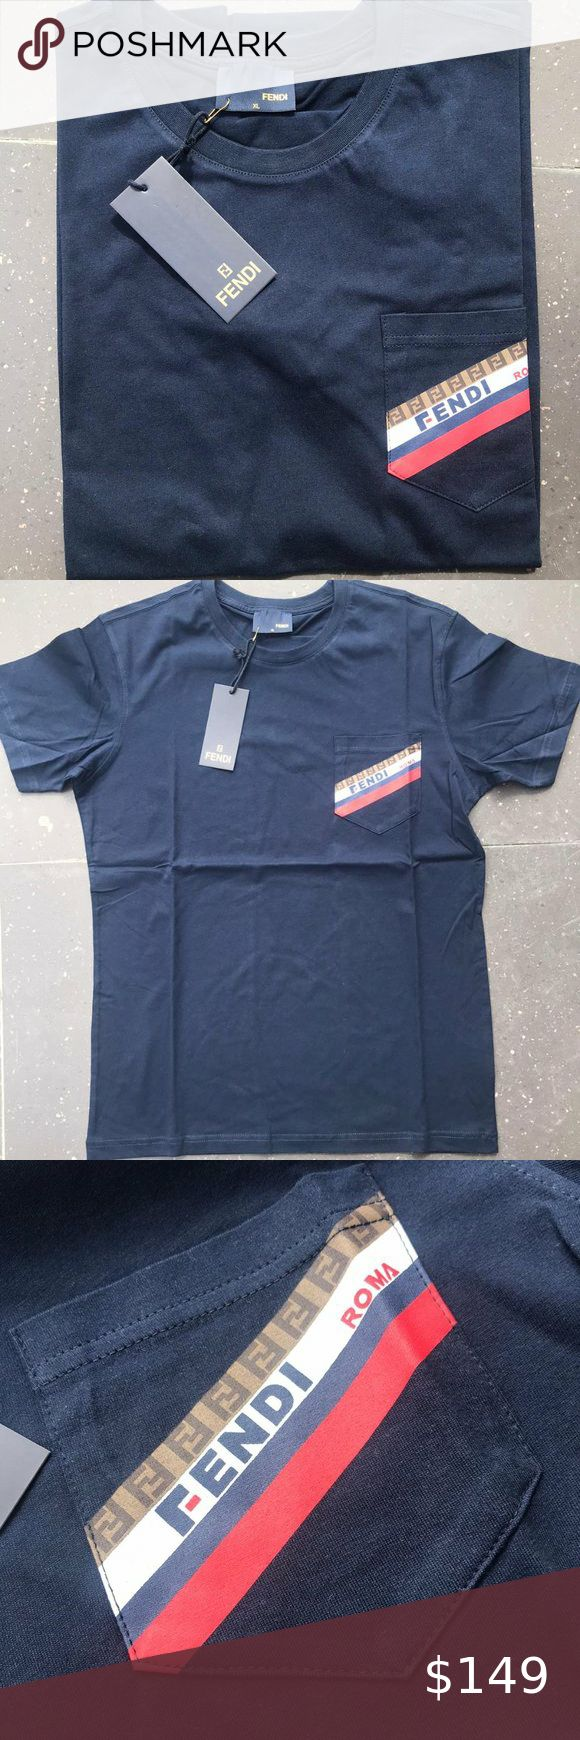 Fendi Roma Men Shirt Brand New Factory Sealed With Tag Cotton Xl Fendi Sh Brand Cotton Factory Fendi Men Roma Sea Mens Shirts Fendi Fendi Shirt